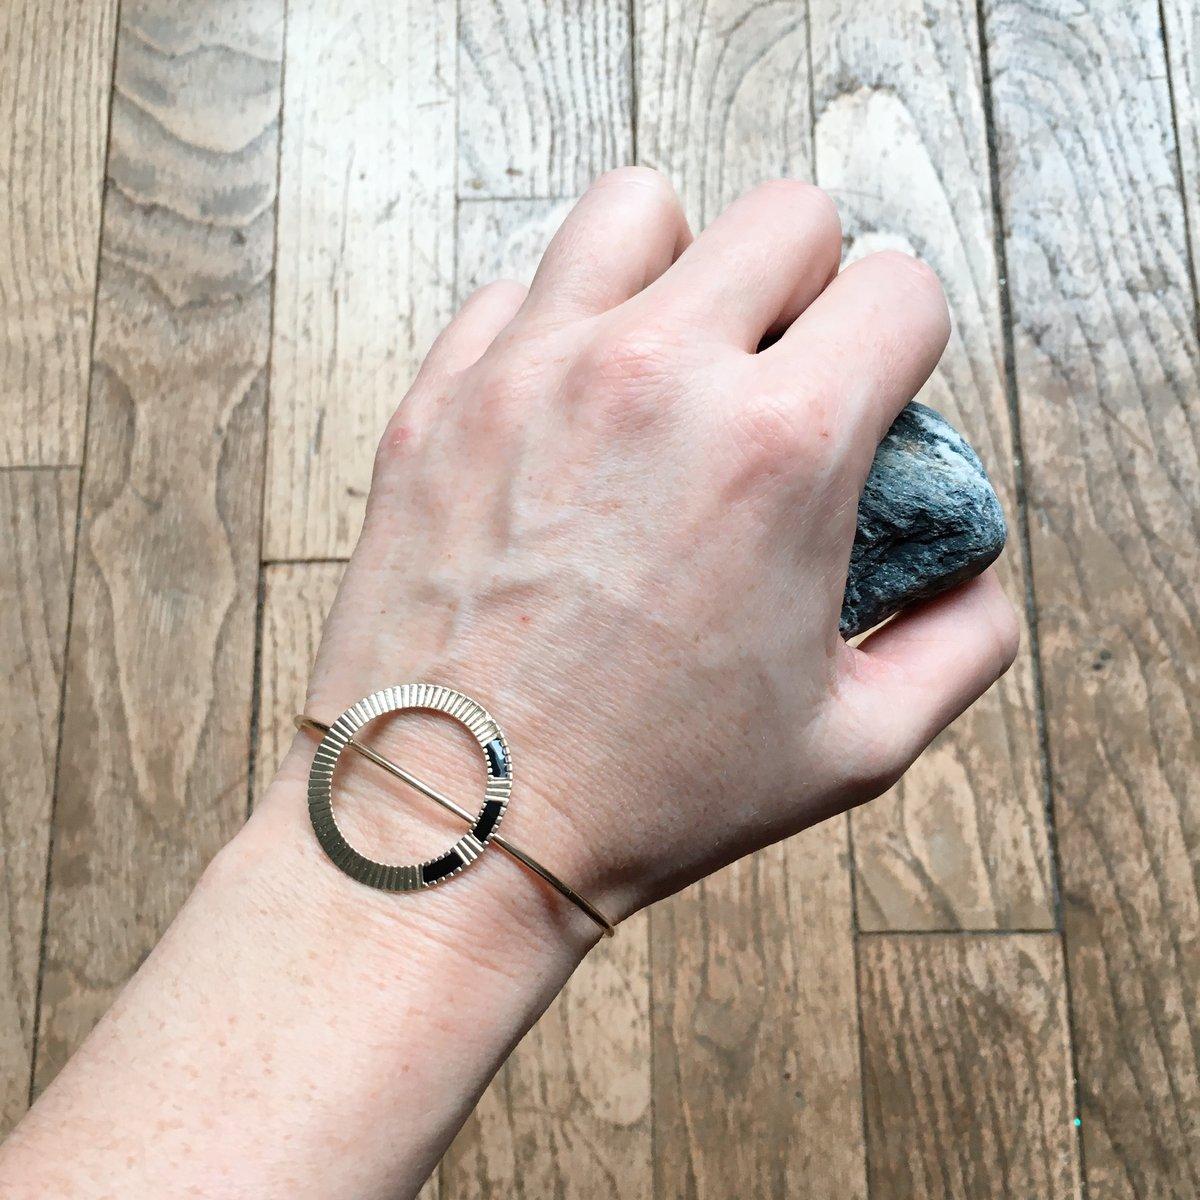 Bracelet Gone